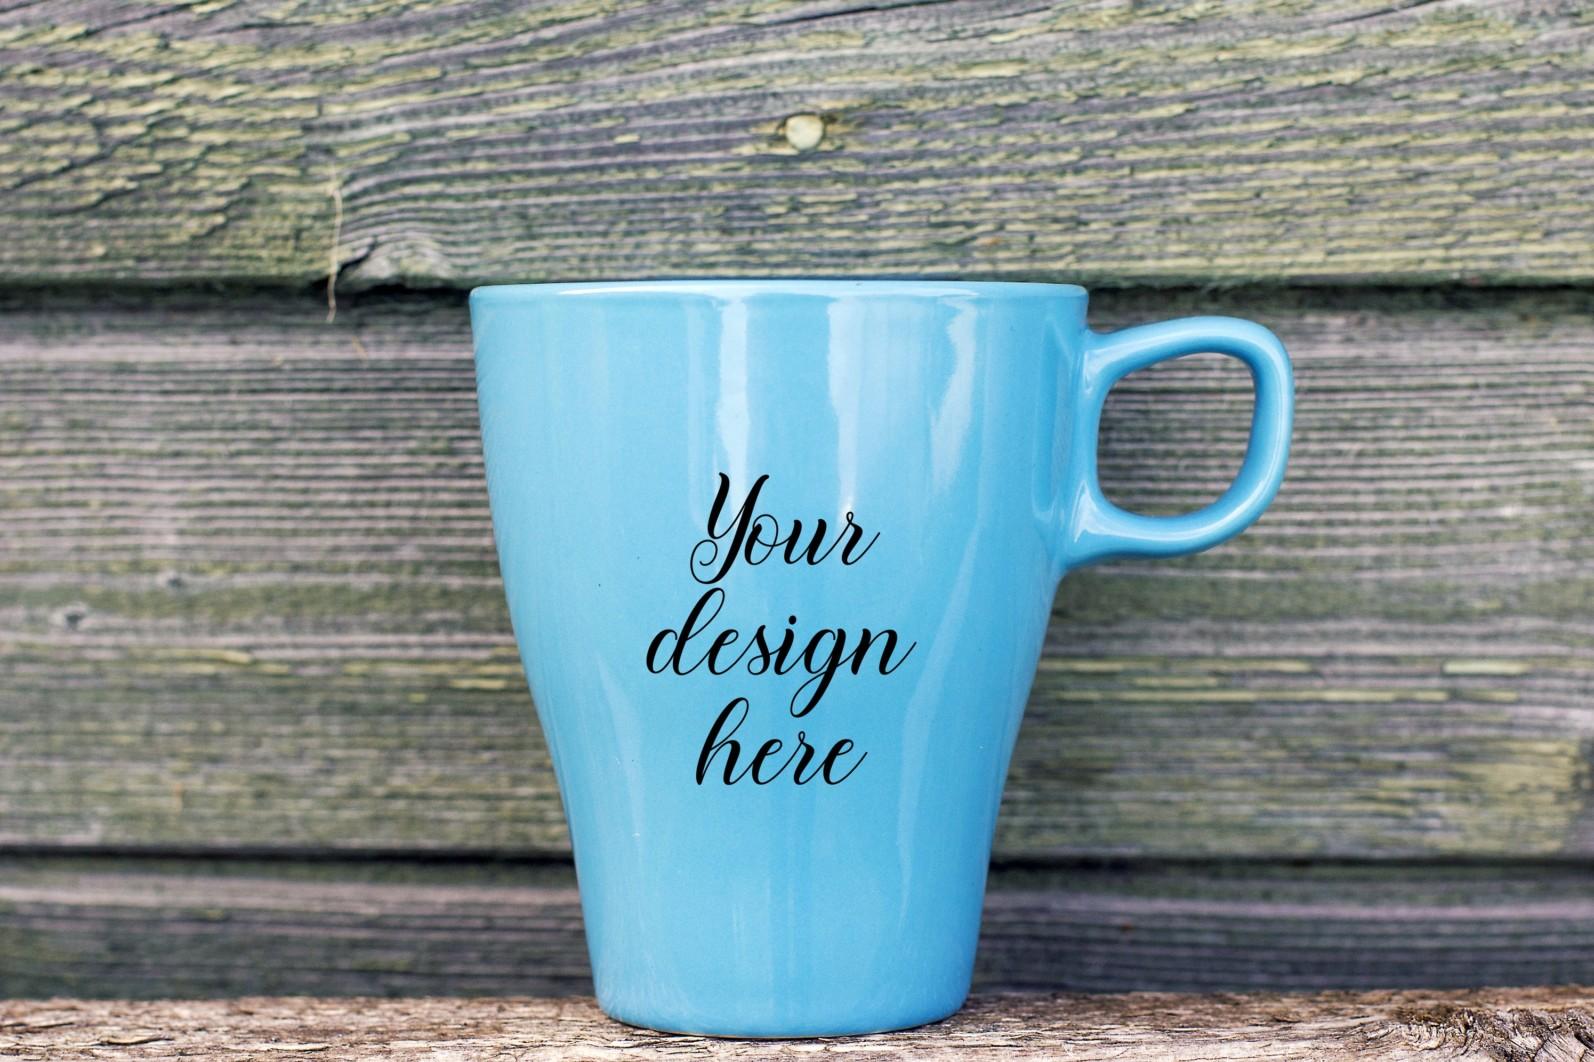 Coffee mug mockup bundle. Mug template bundle. PSD, JPEG files. - 11 1 1 scaled -